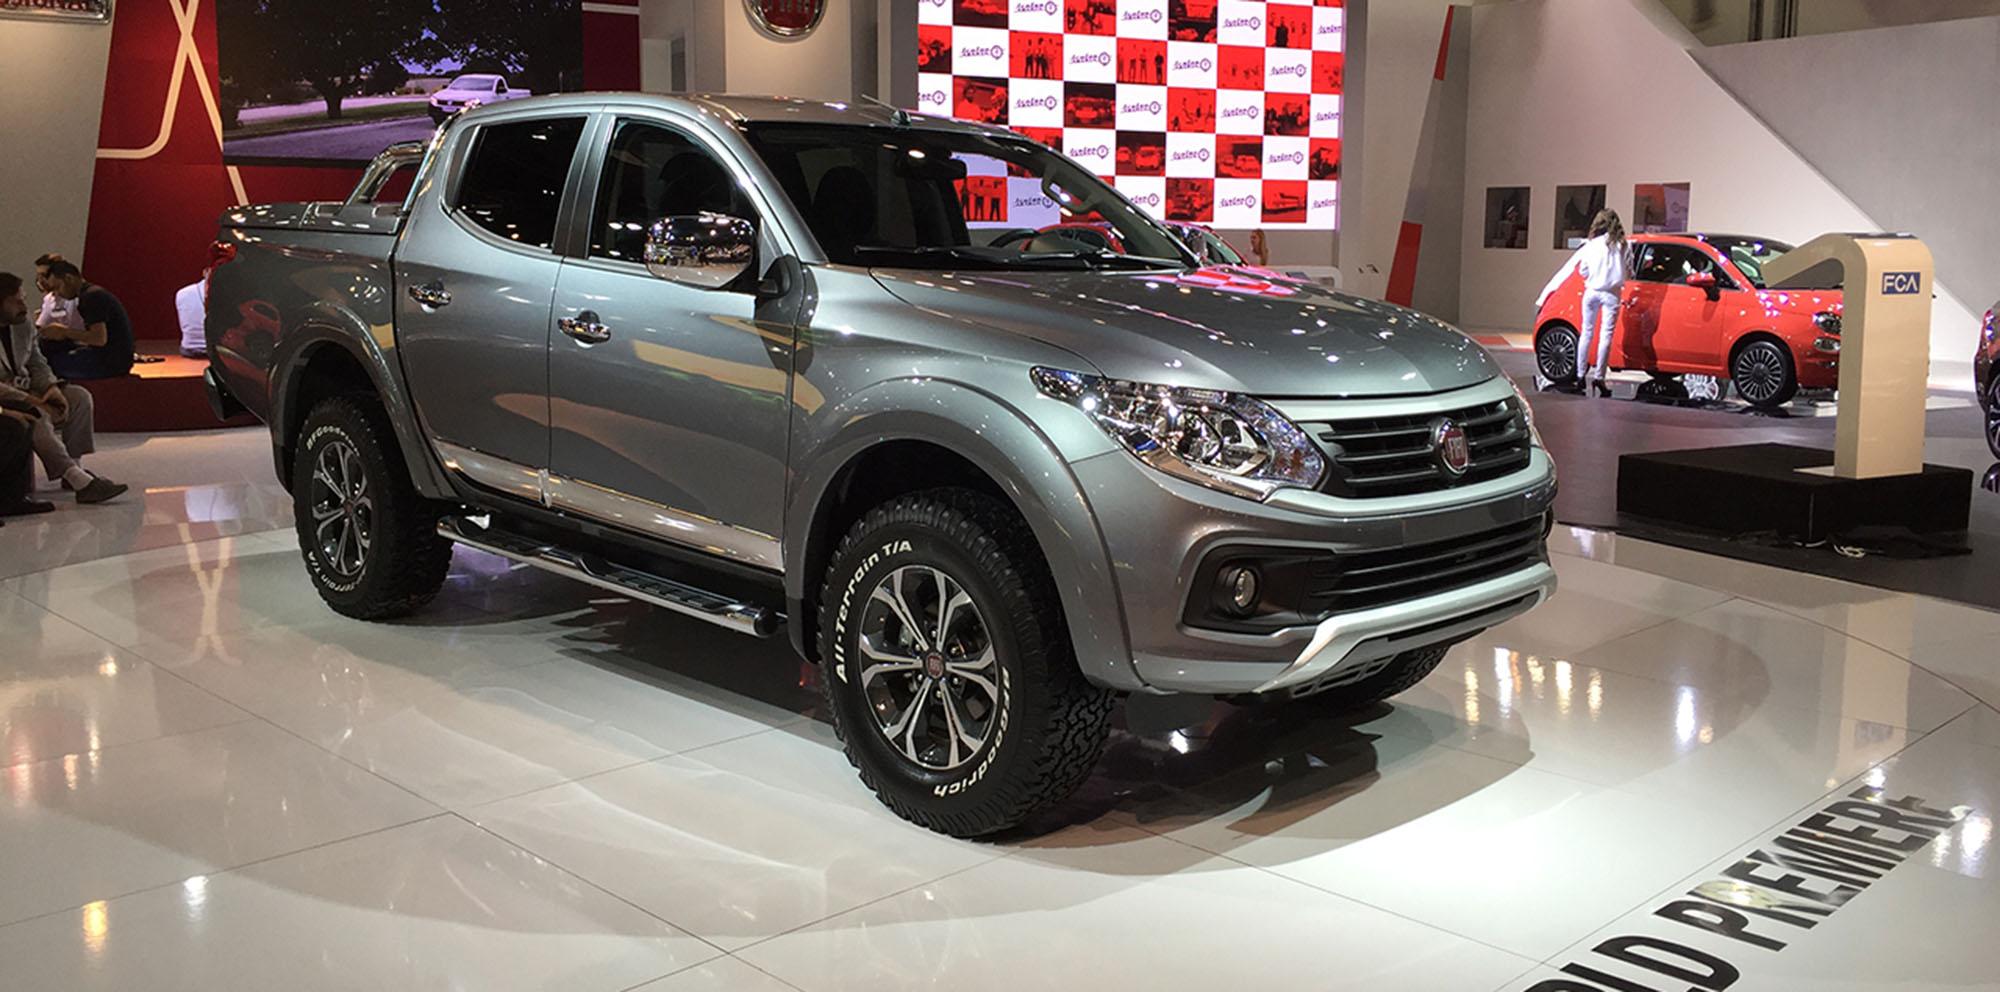 Western Auto Sales >> Fiat Fullback ute unveiled in Dubai - photos | CarAdvice